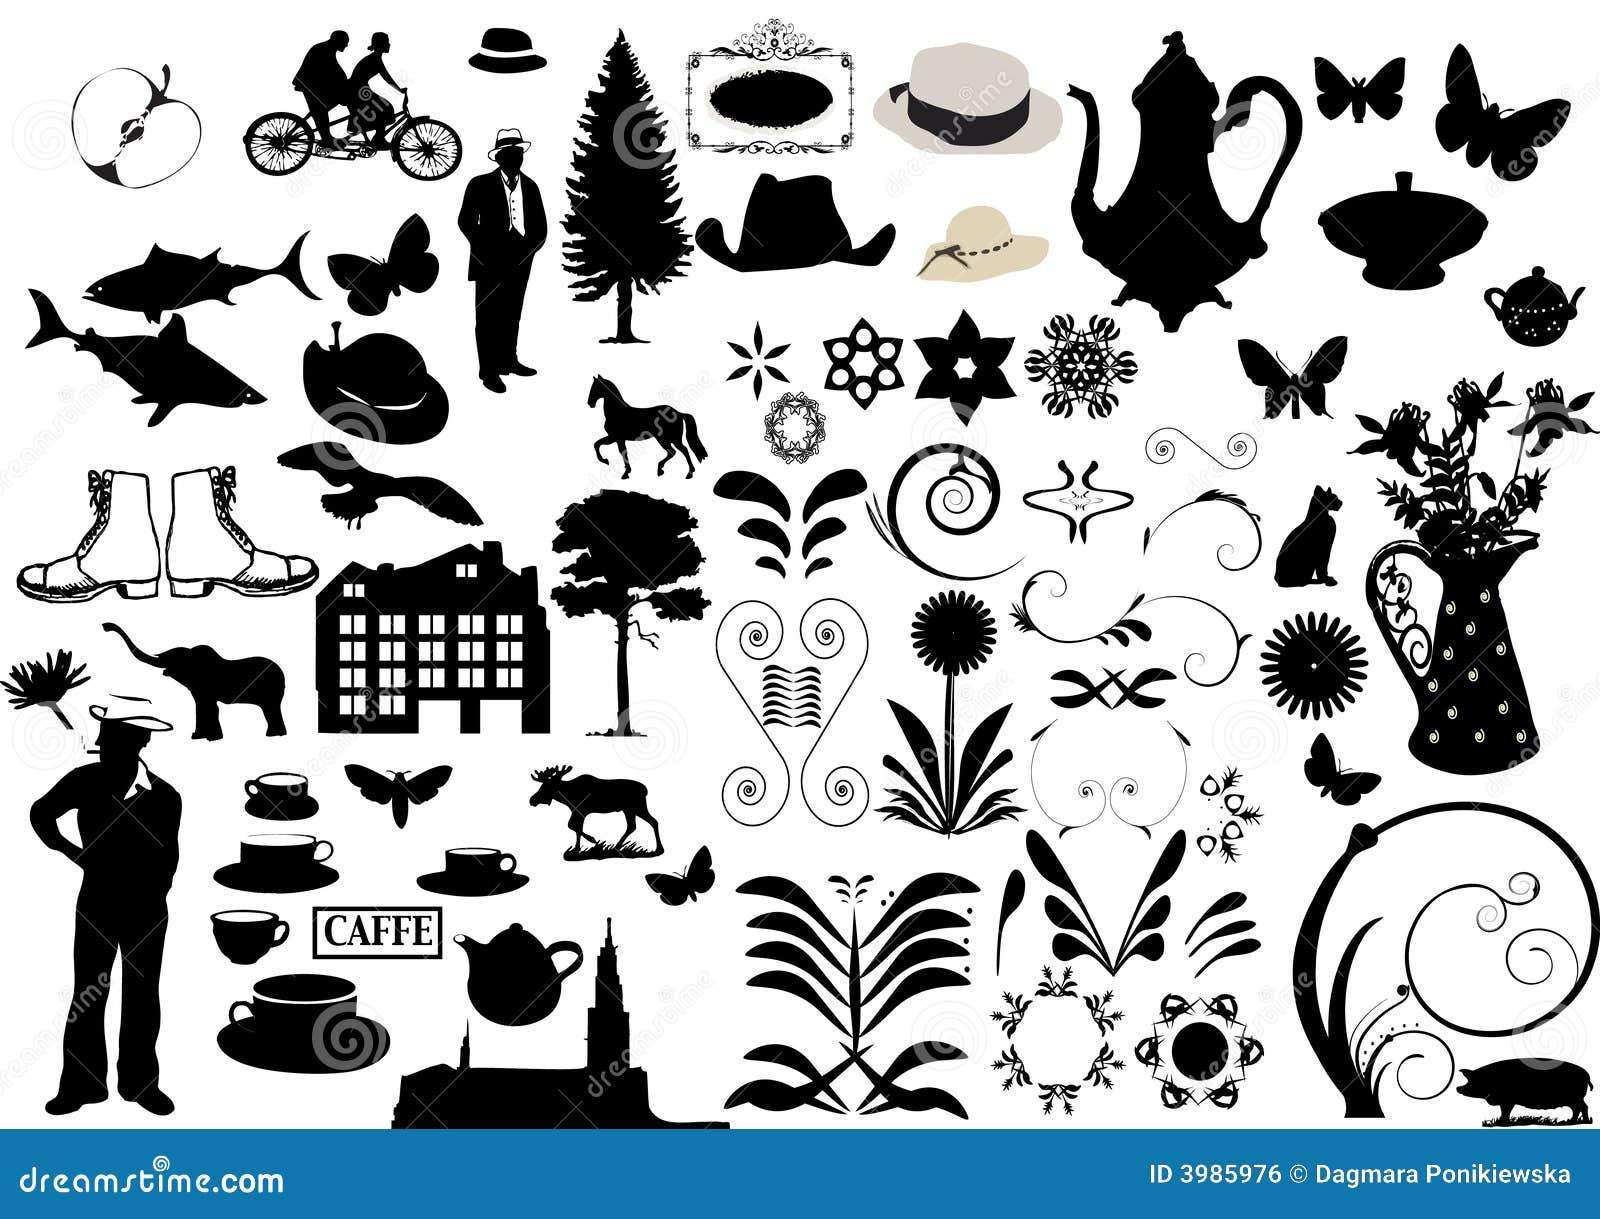 floral ornaments elements for design stock illustration